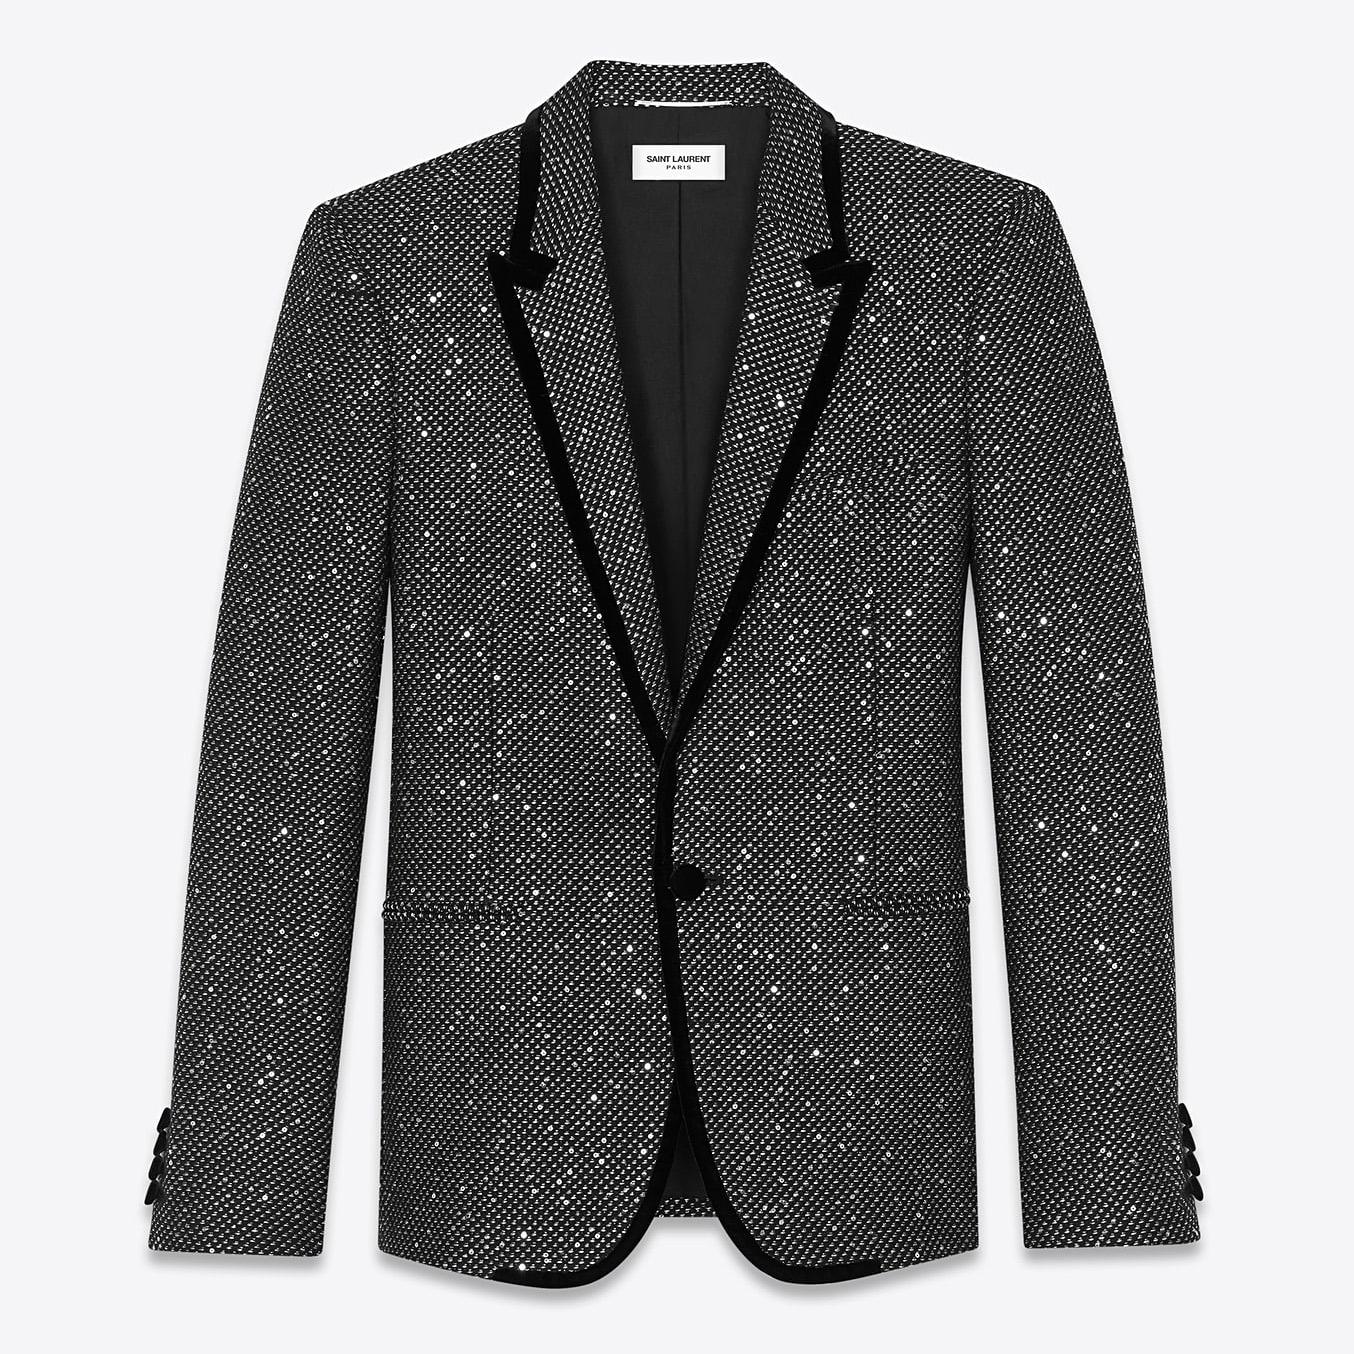 Saint Laurent Long Jacket In Spangled Black And Silver Tweed